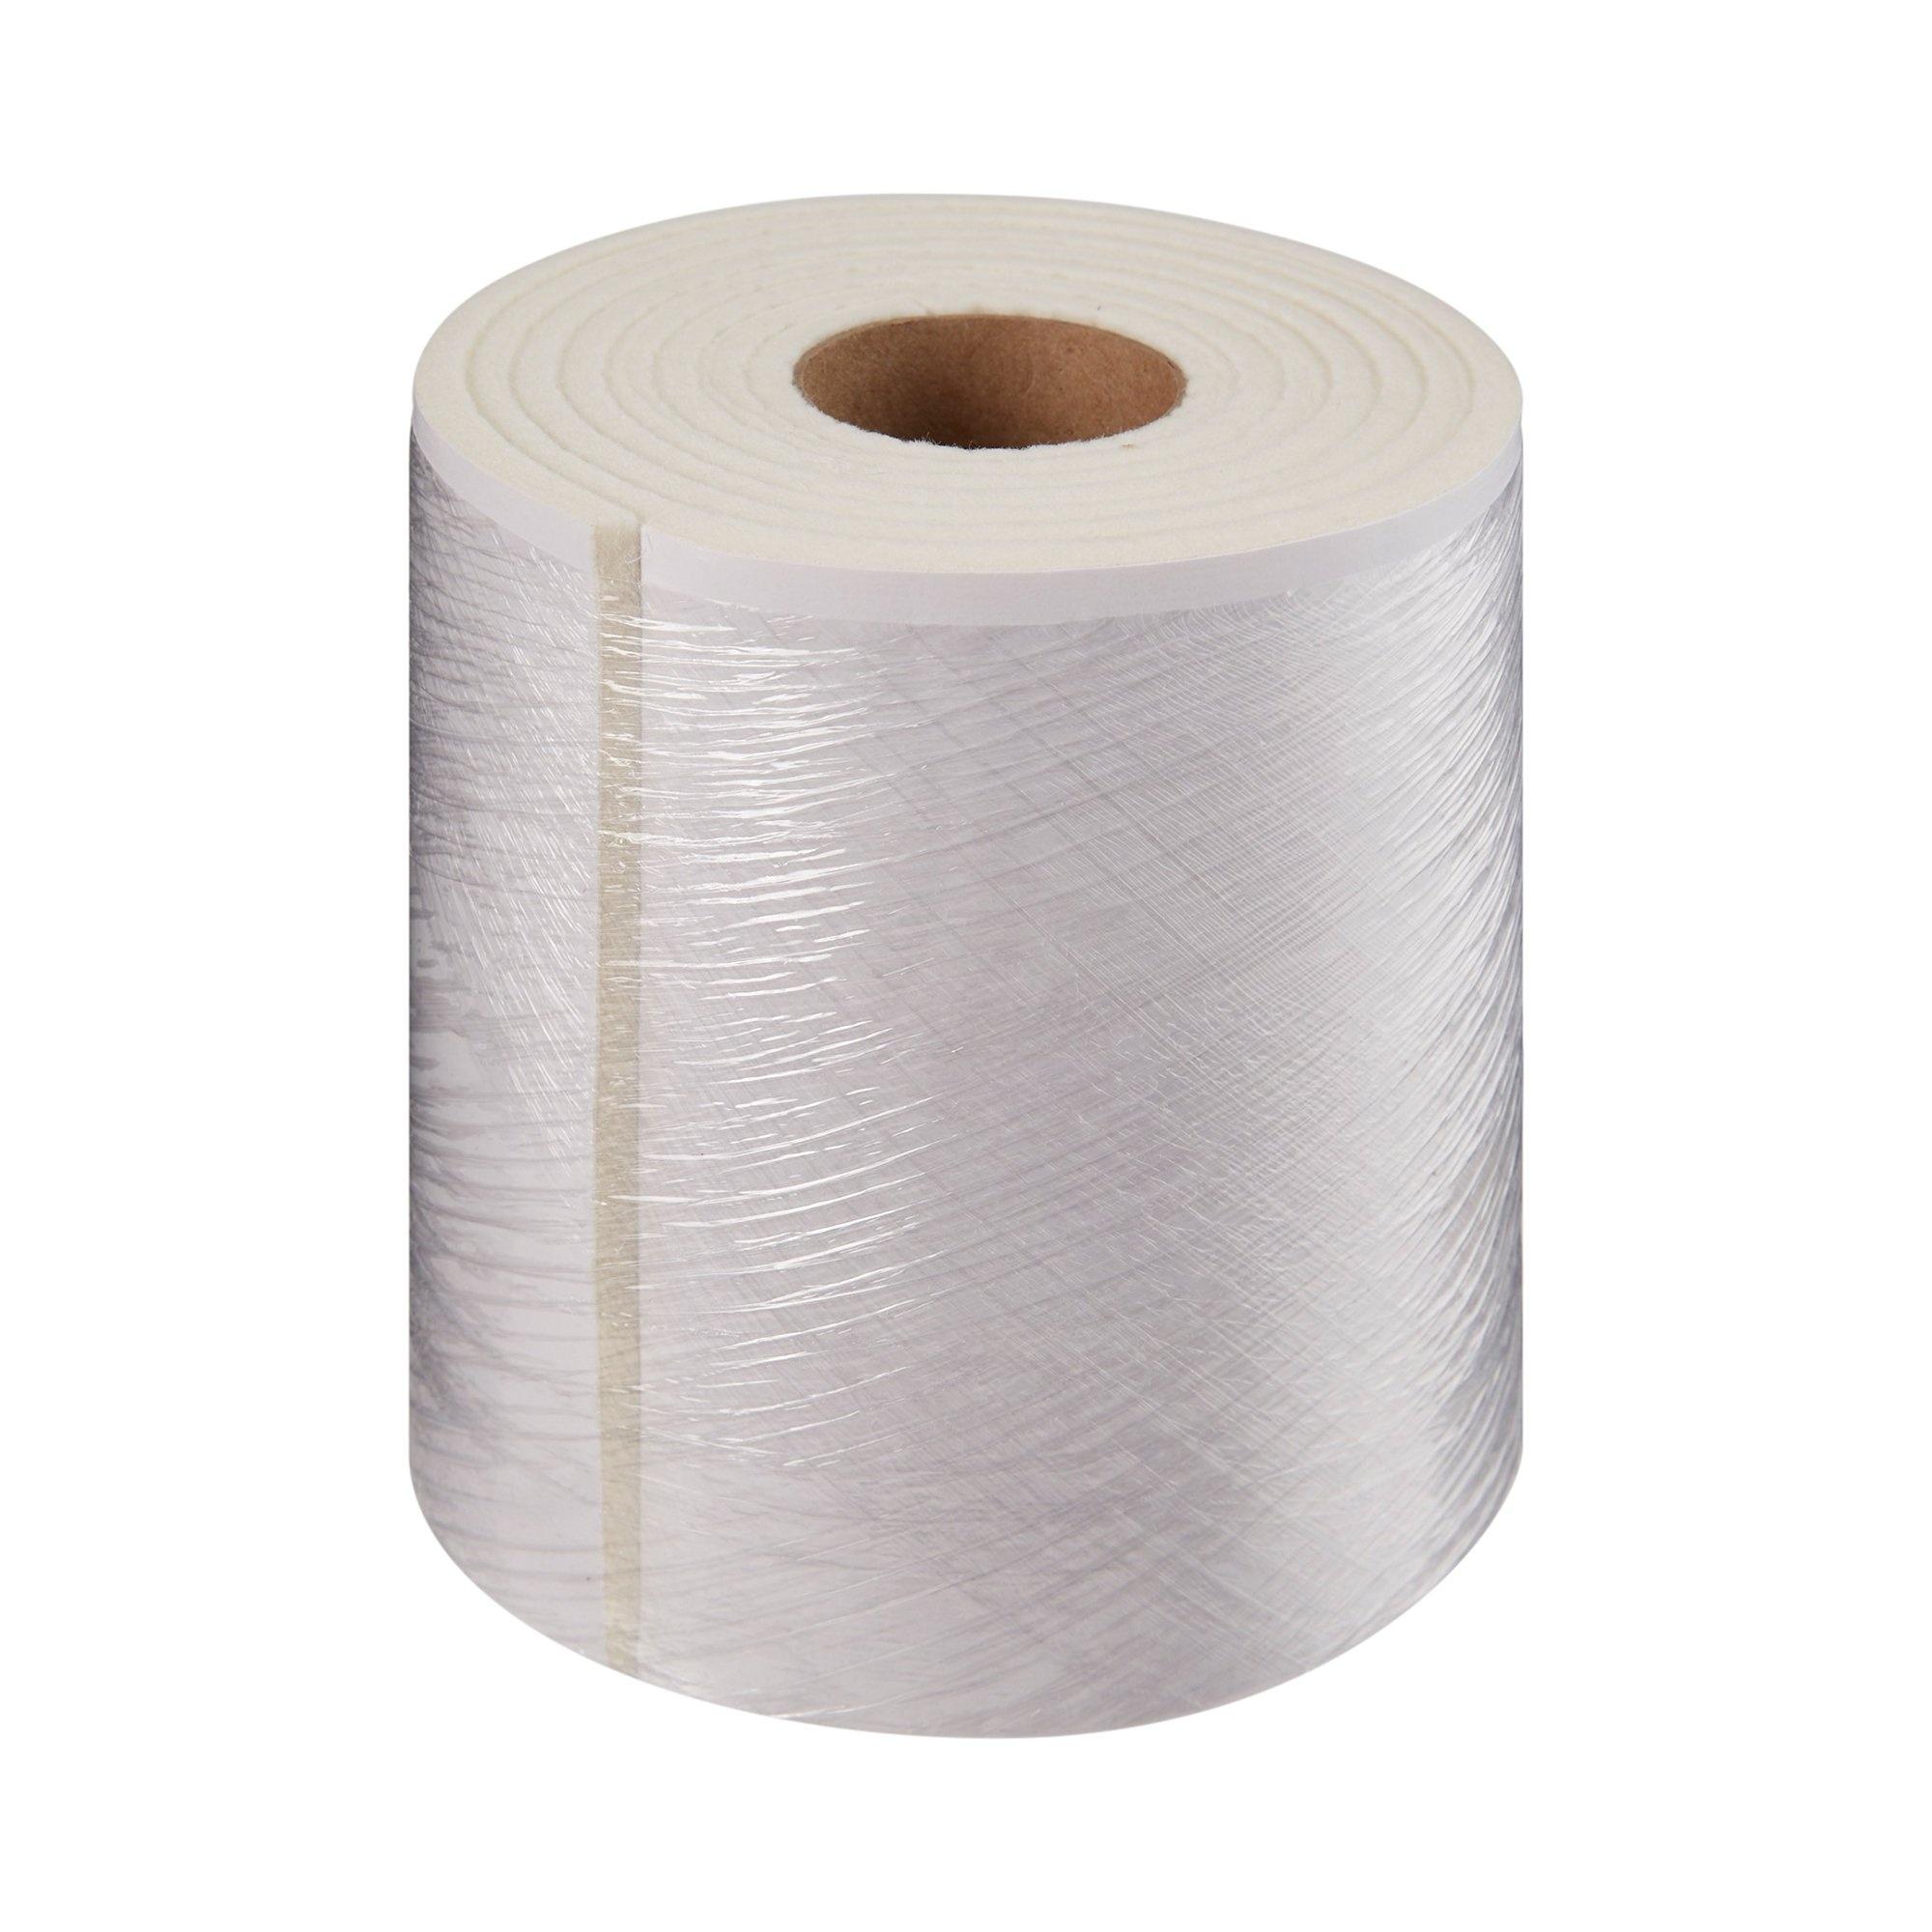 "McKesson White Wool/Rayon Adhesive Orthopedic Felt Roll, 6"" x 2.5 yd, 9229, 1 Roll"